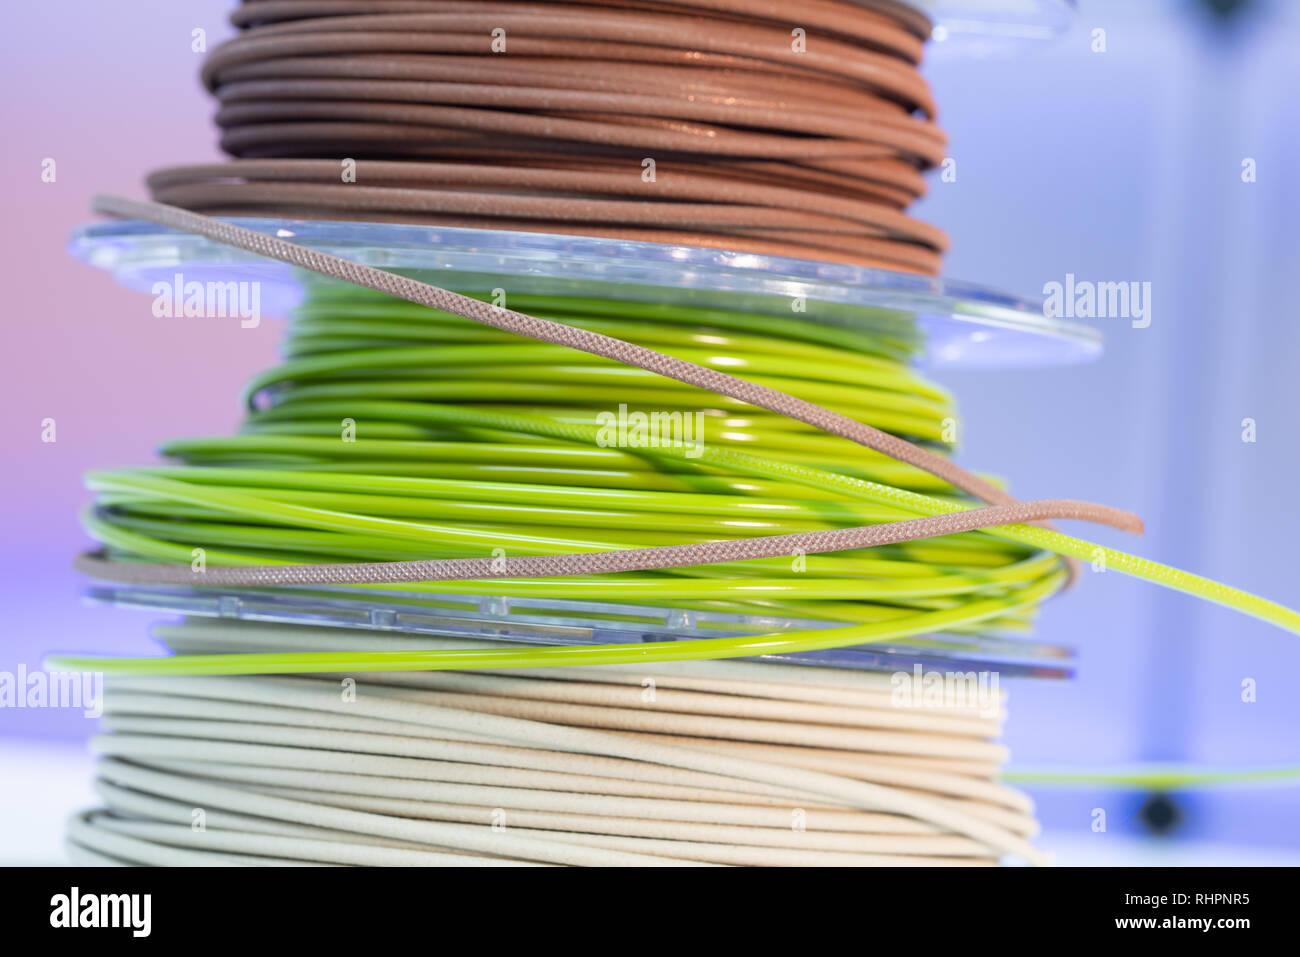 Spools of plastic PETG filaments for 3D Printer - Stock Image